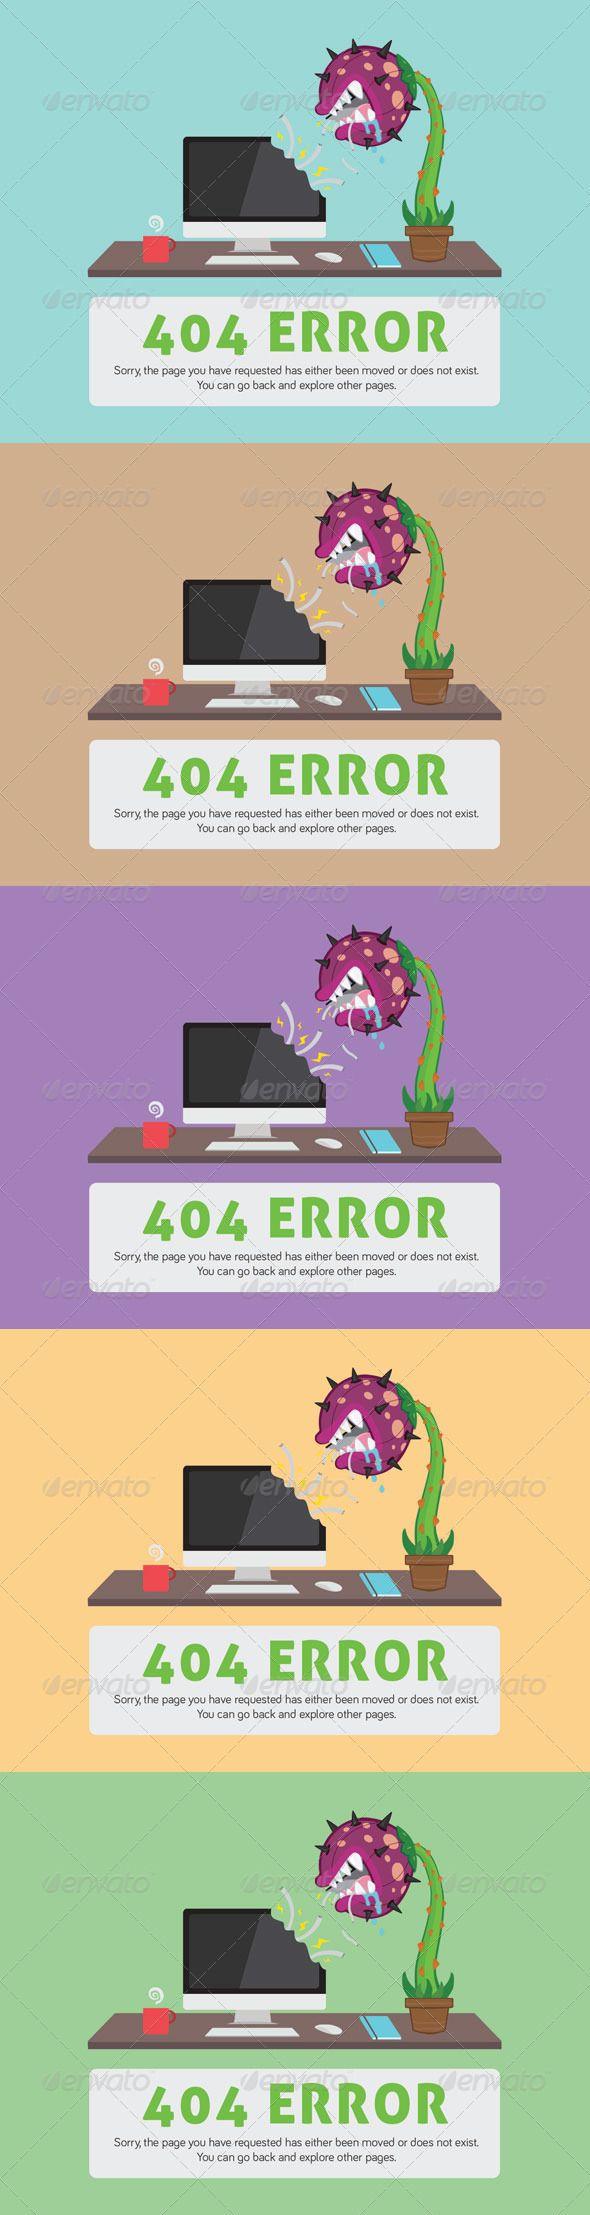 Carnivorous Plant 404 ERROR Web Page - 404 Pages Web Elements Download here : https://graphicriver.net/item/carnivorous-plant-404-error-web-page/3439242?s_rank=190&ref=Al-fatih